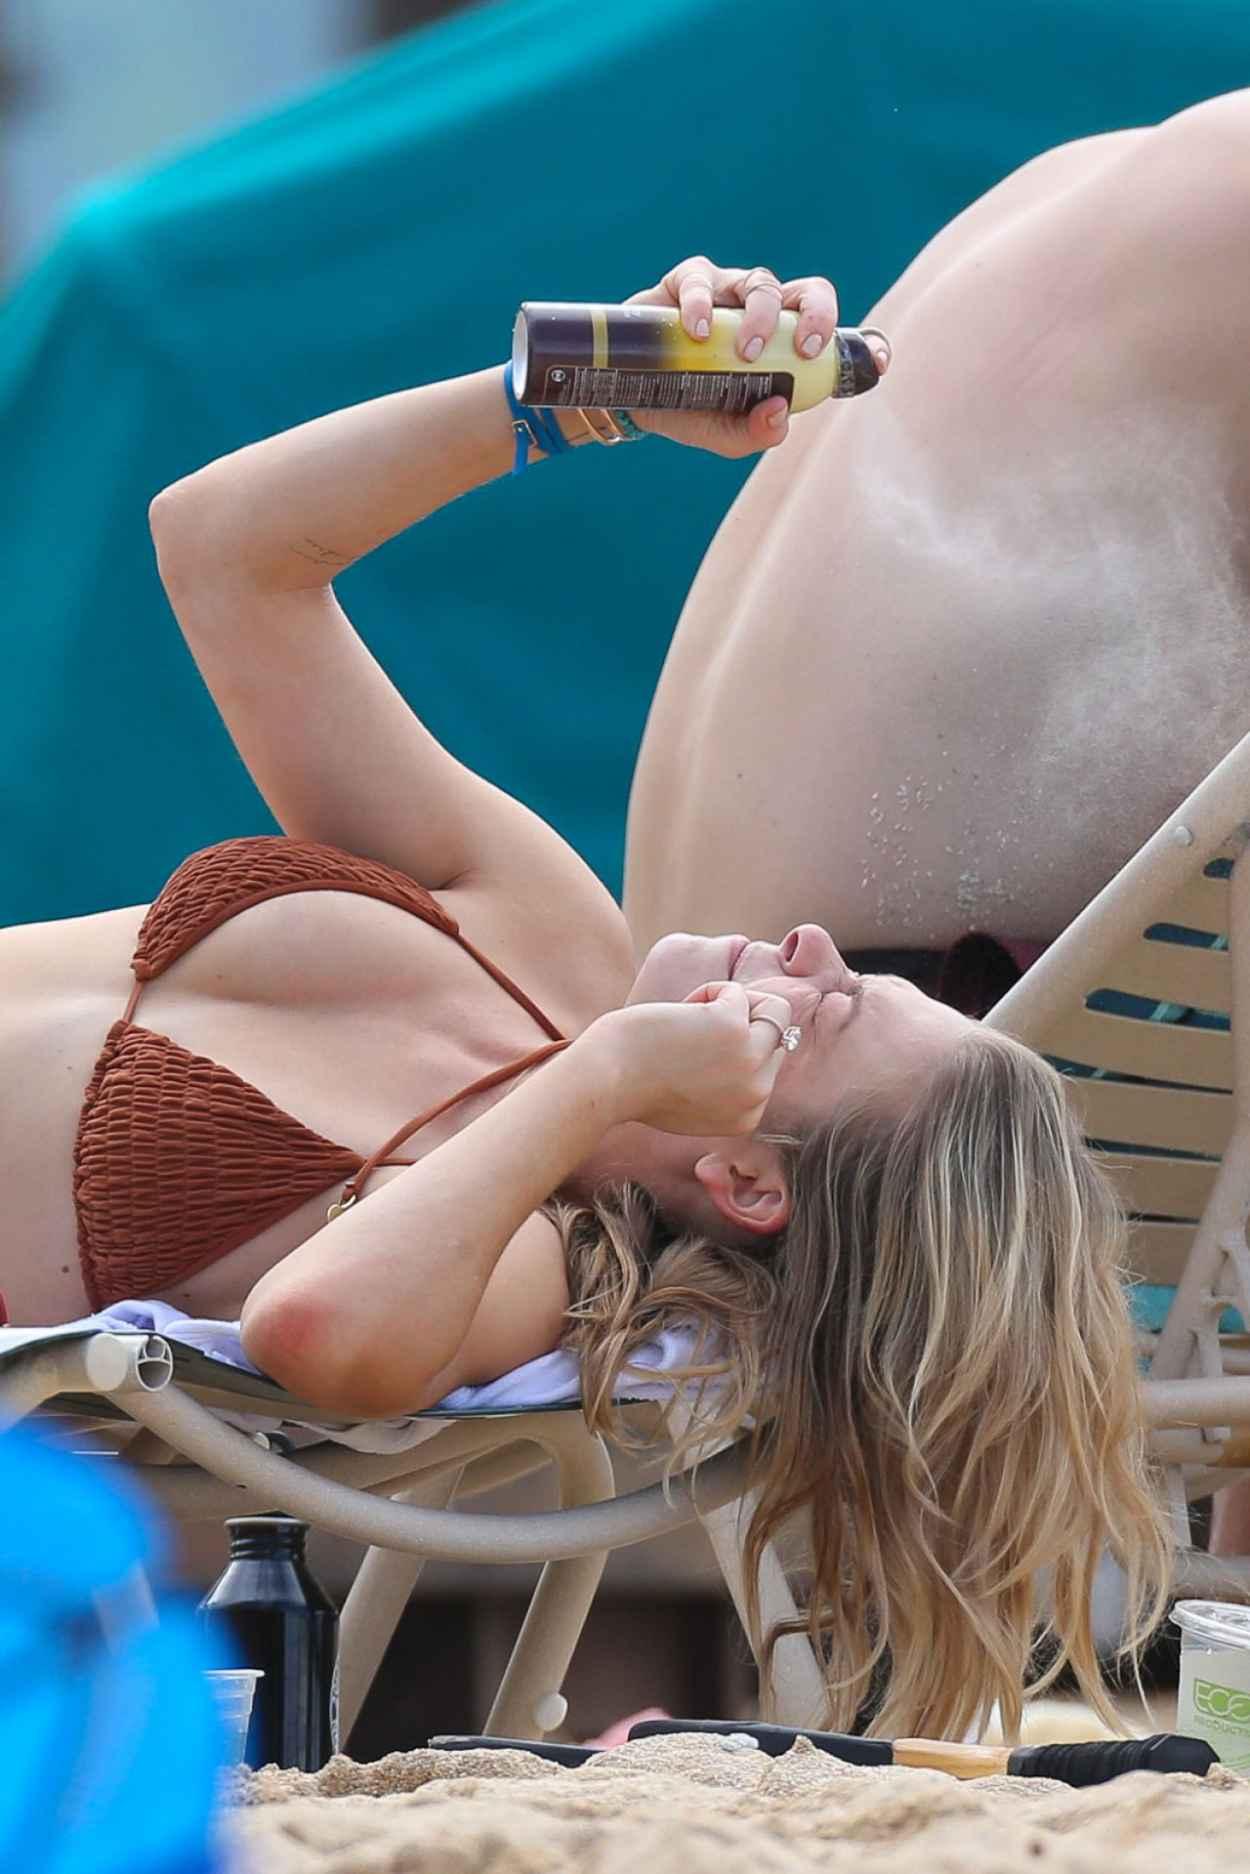 LeAnn Rimes Bikini Candids - Grabs a Bite While Soaking up the Sun - February 2015-5